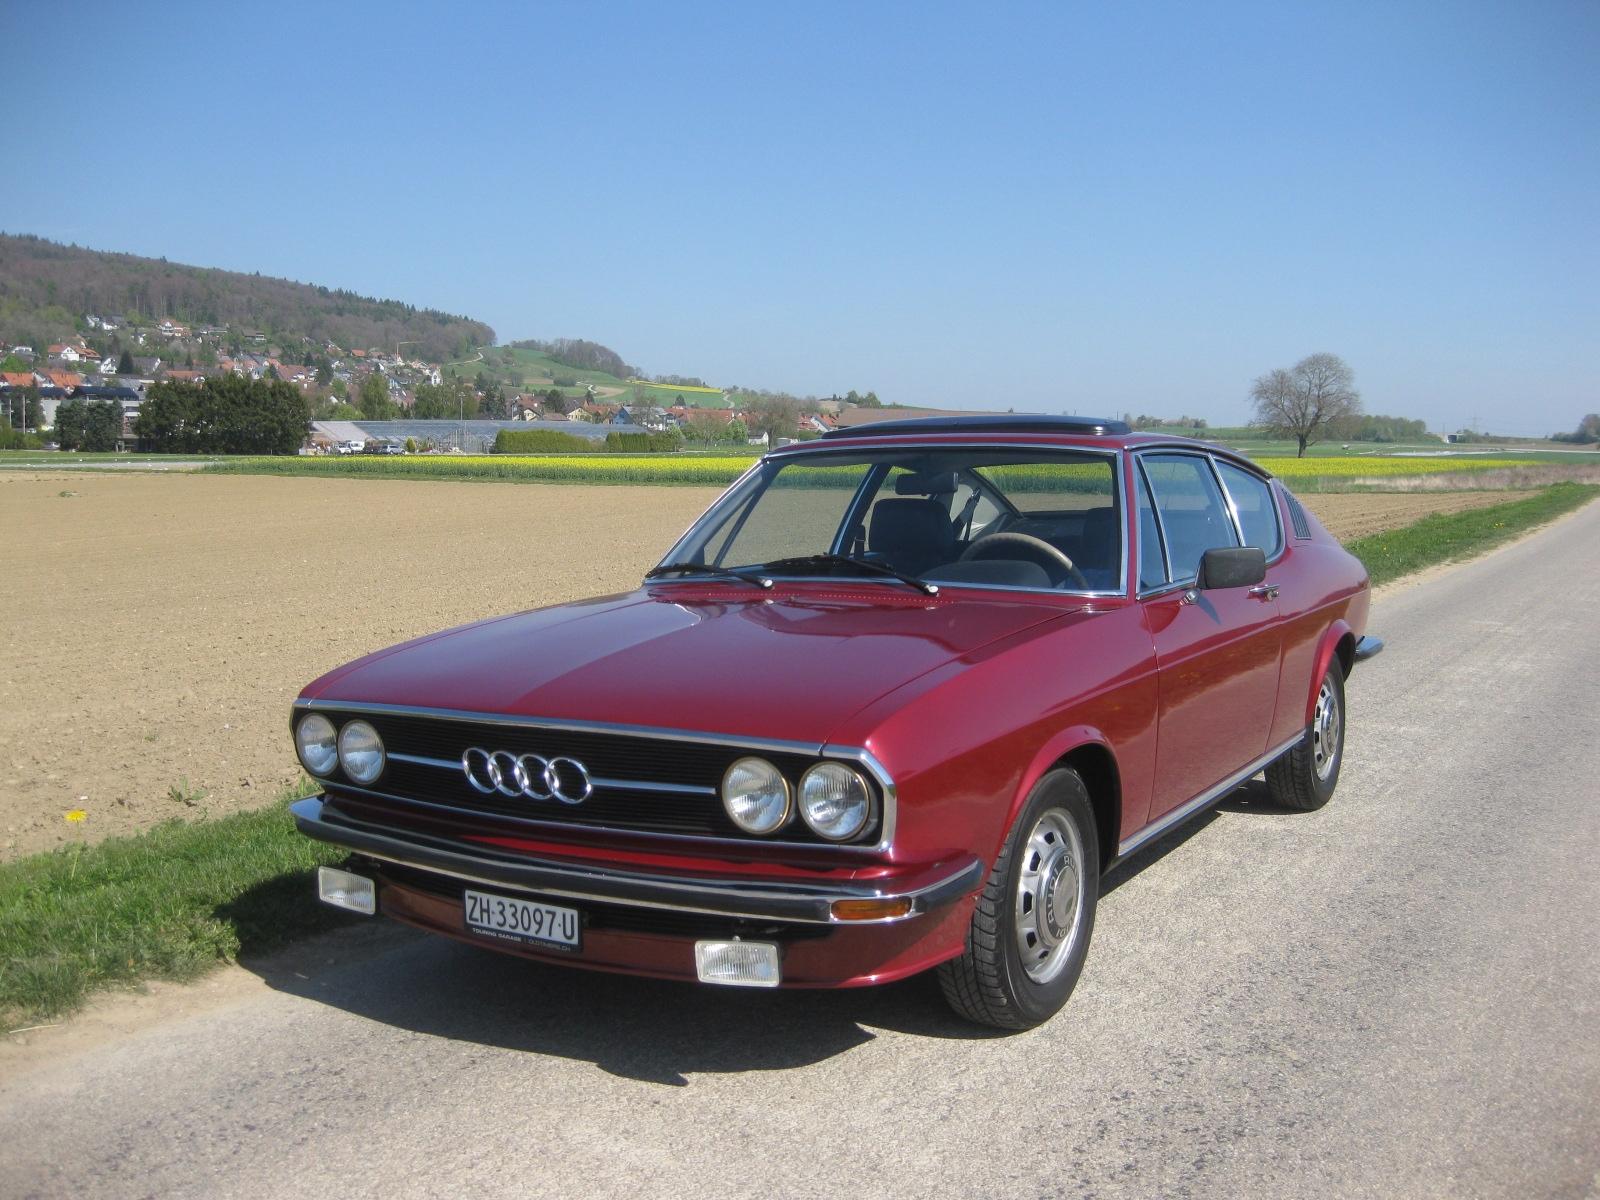 Touring Garage AG | Audi 100 S Coupé 1976